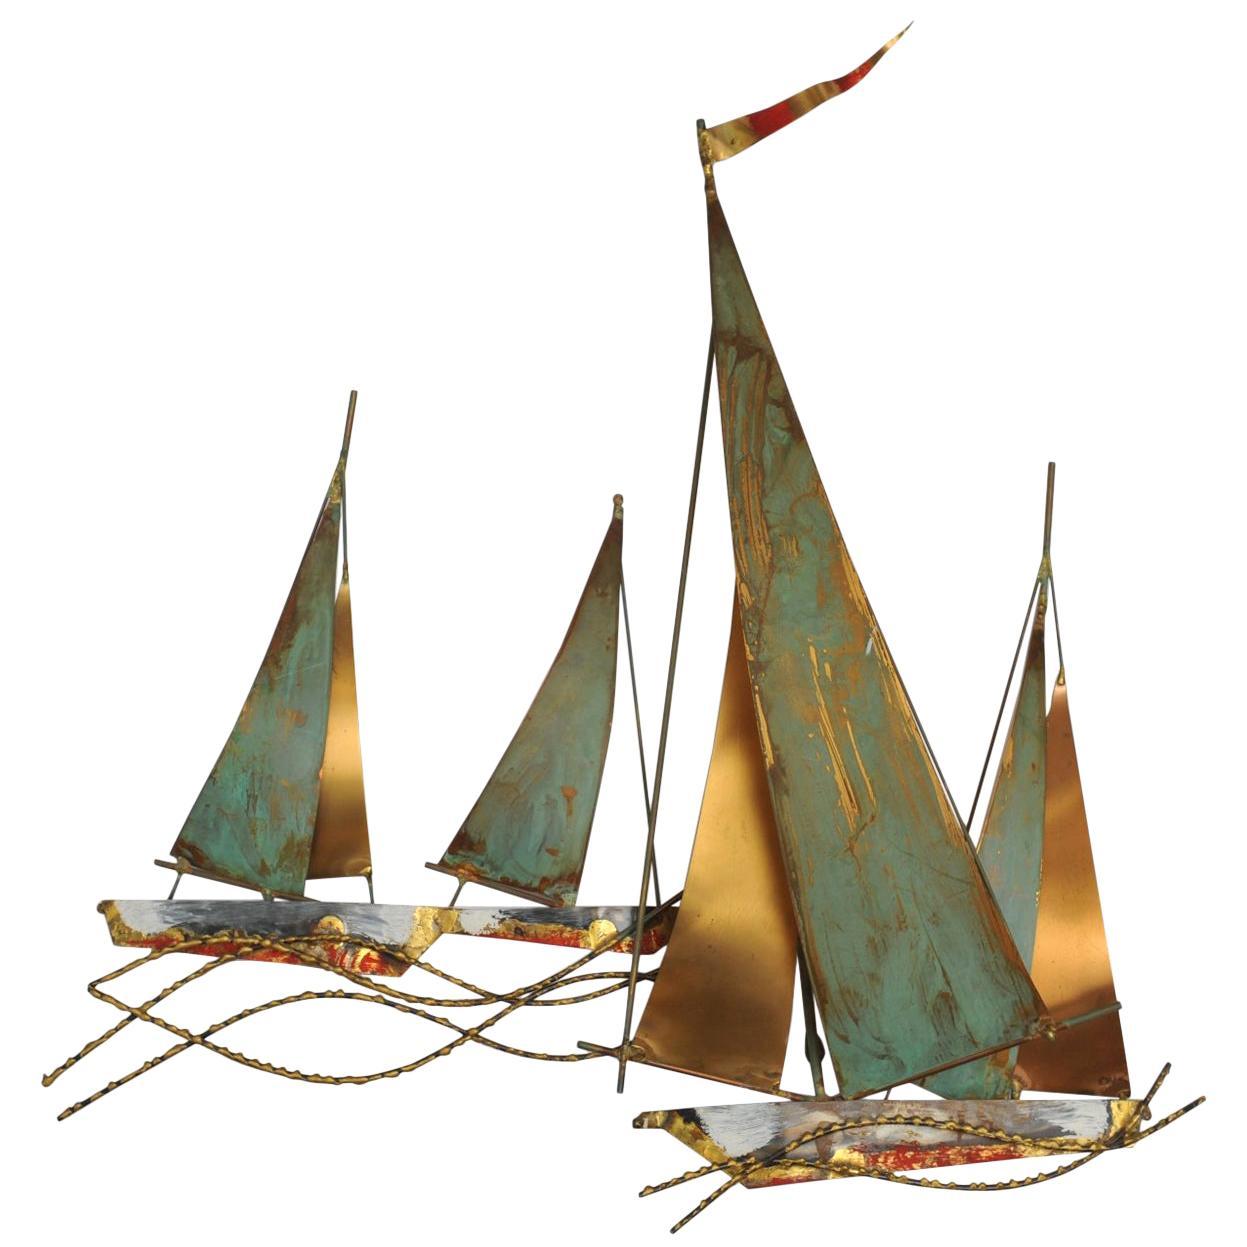 Curtis Jeré Brutalist Period Nautical Sailboat Wall Sculpture, 1969